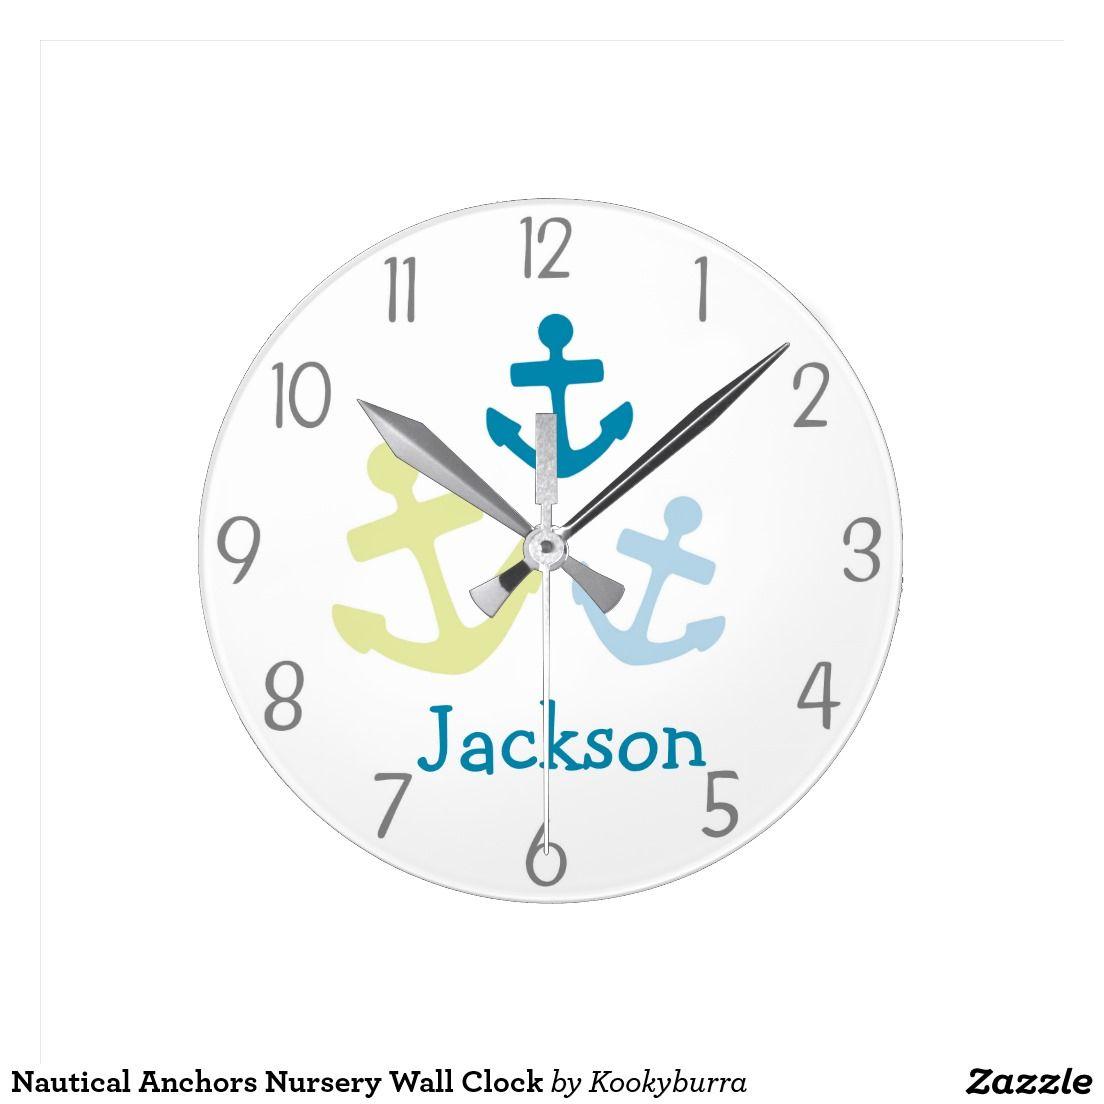 Nautical anchors nursery wall clock nursery nautical anchors nursery wall clock amipublicfo Images